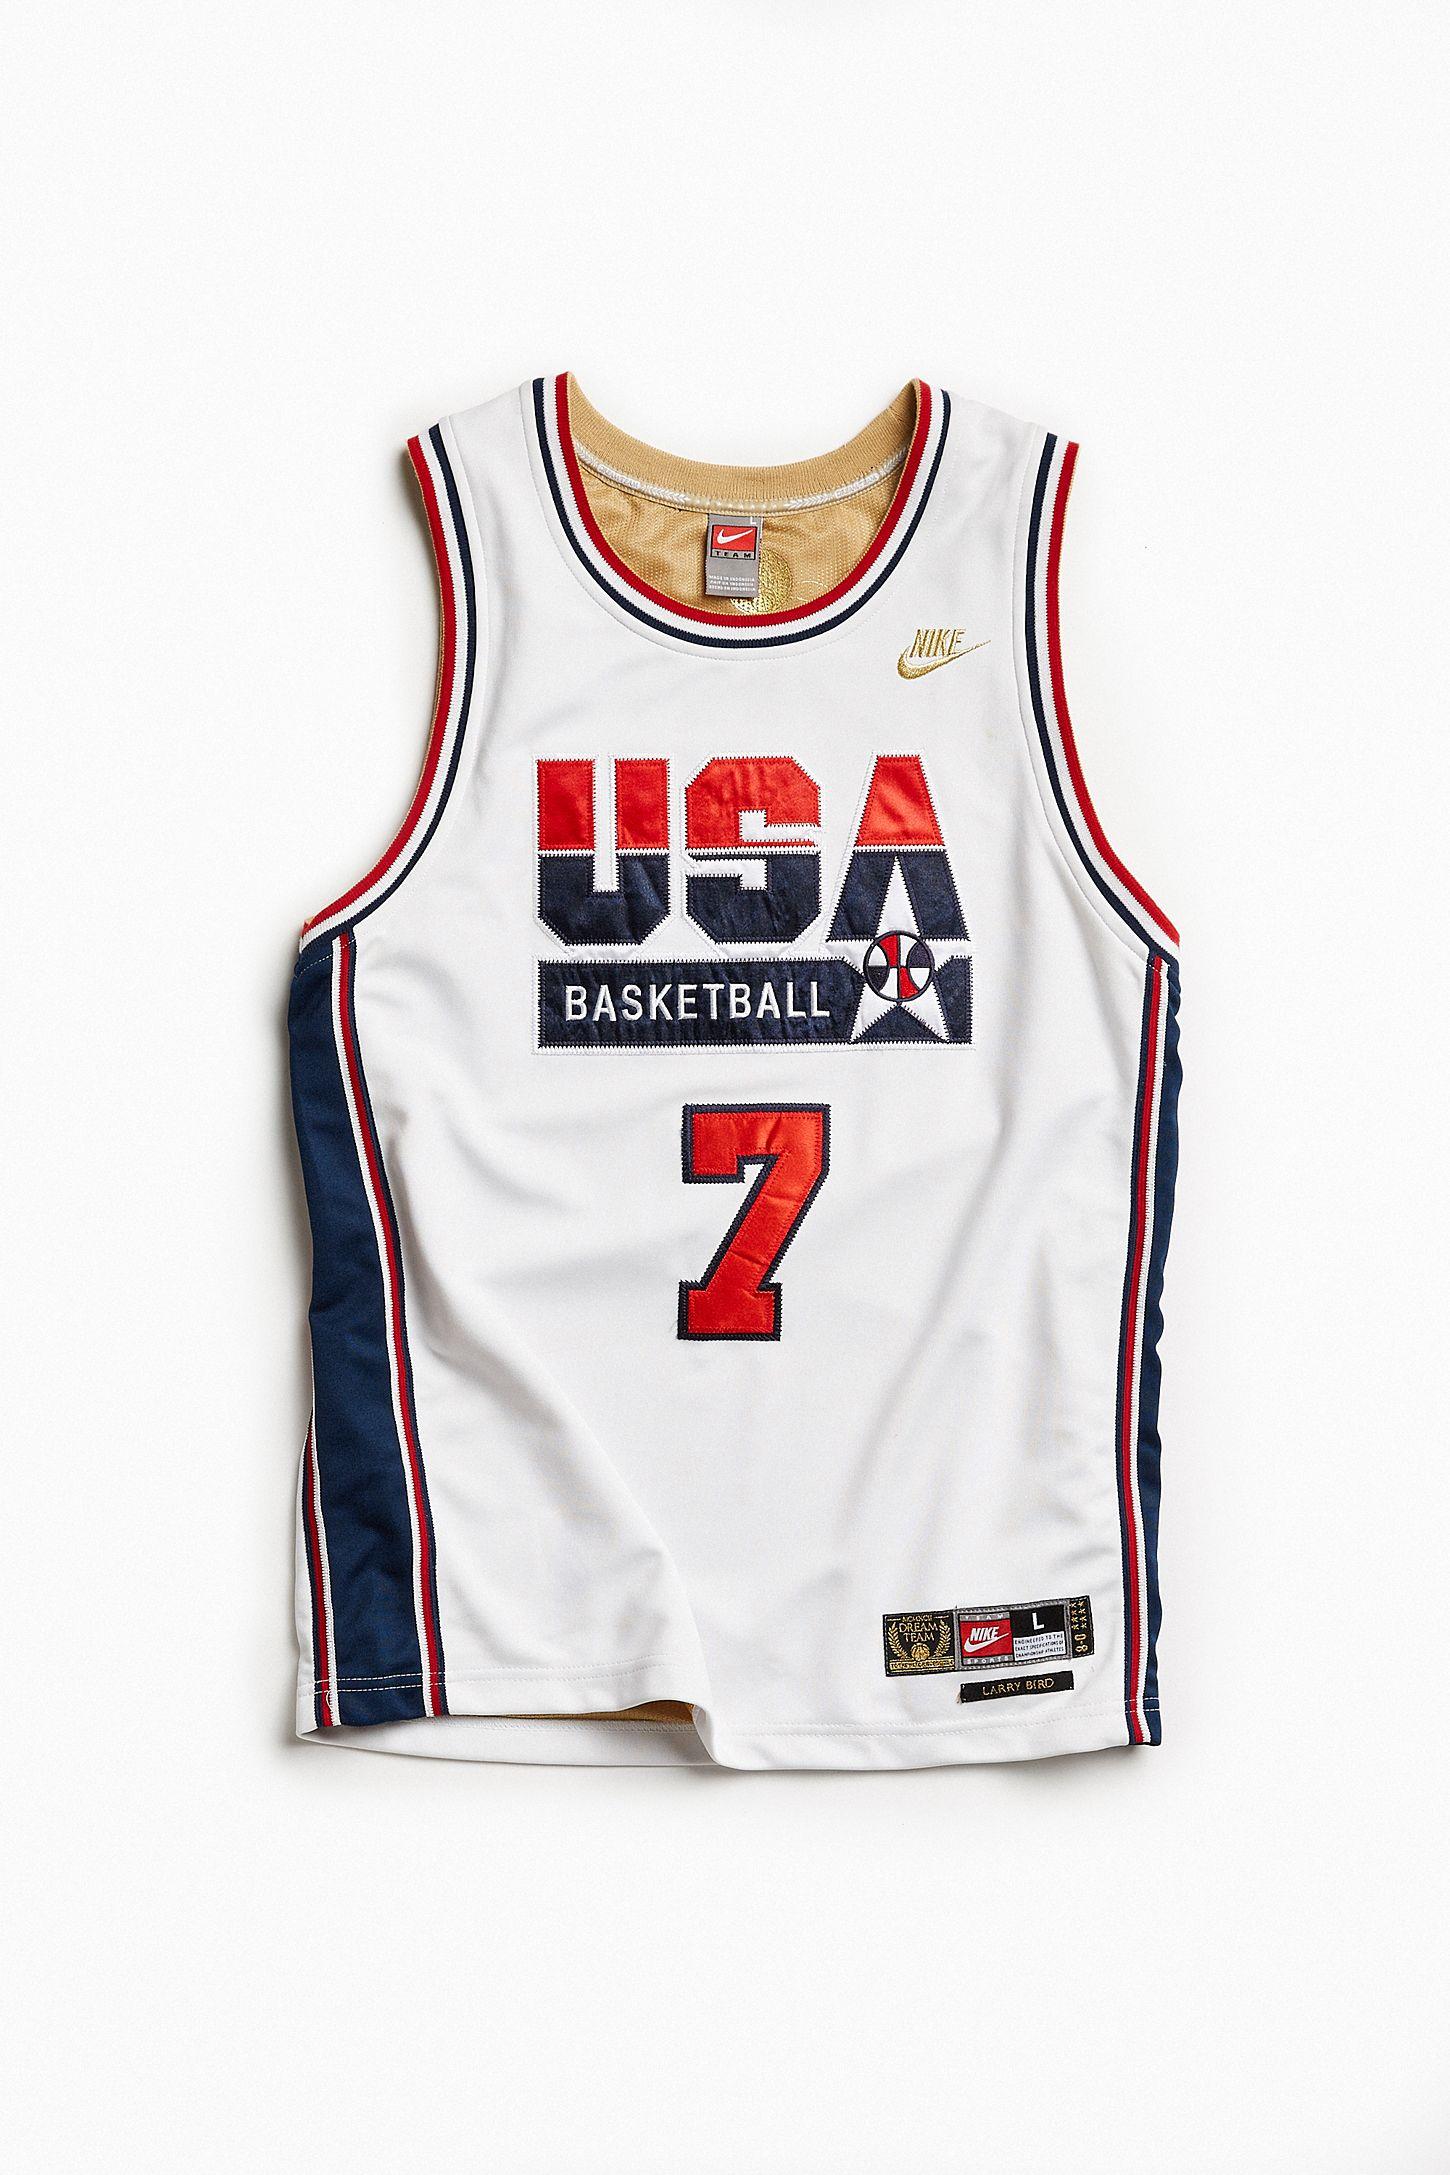 Team Usa Shirt Nike   Kuenzi Turf & Nursery